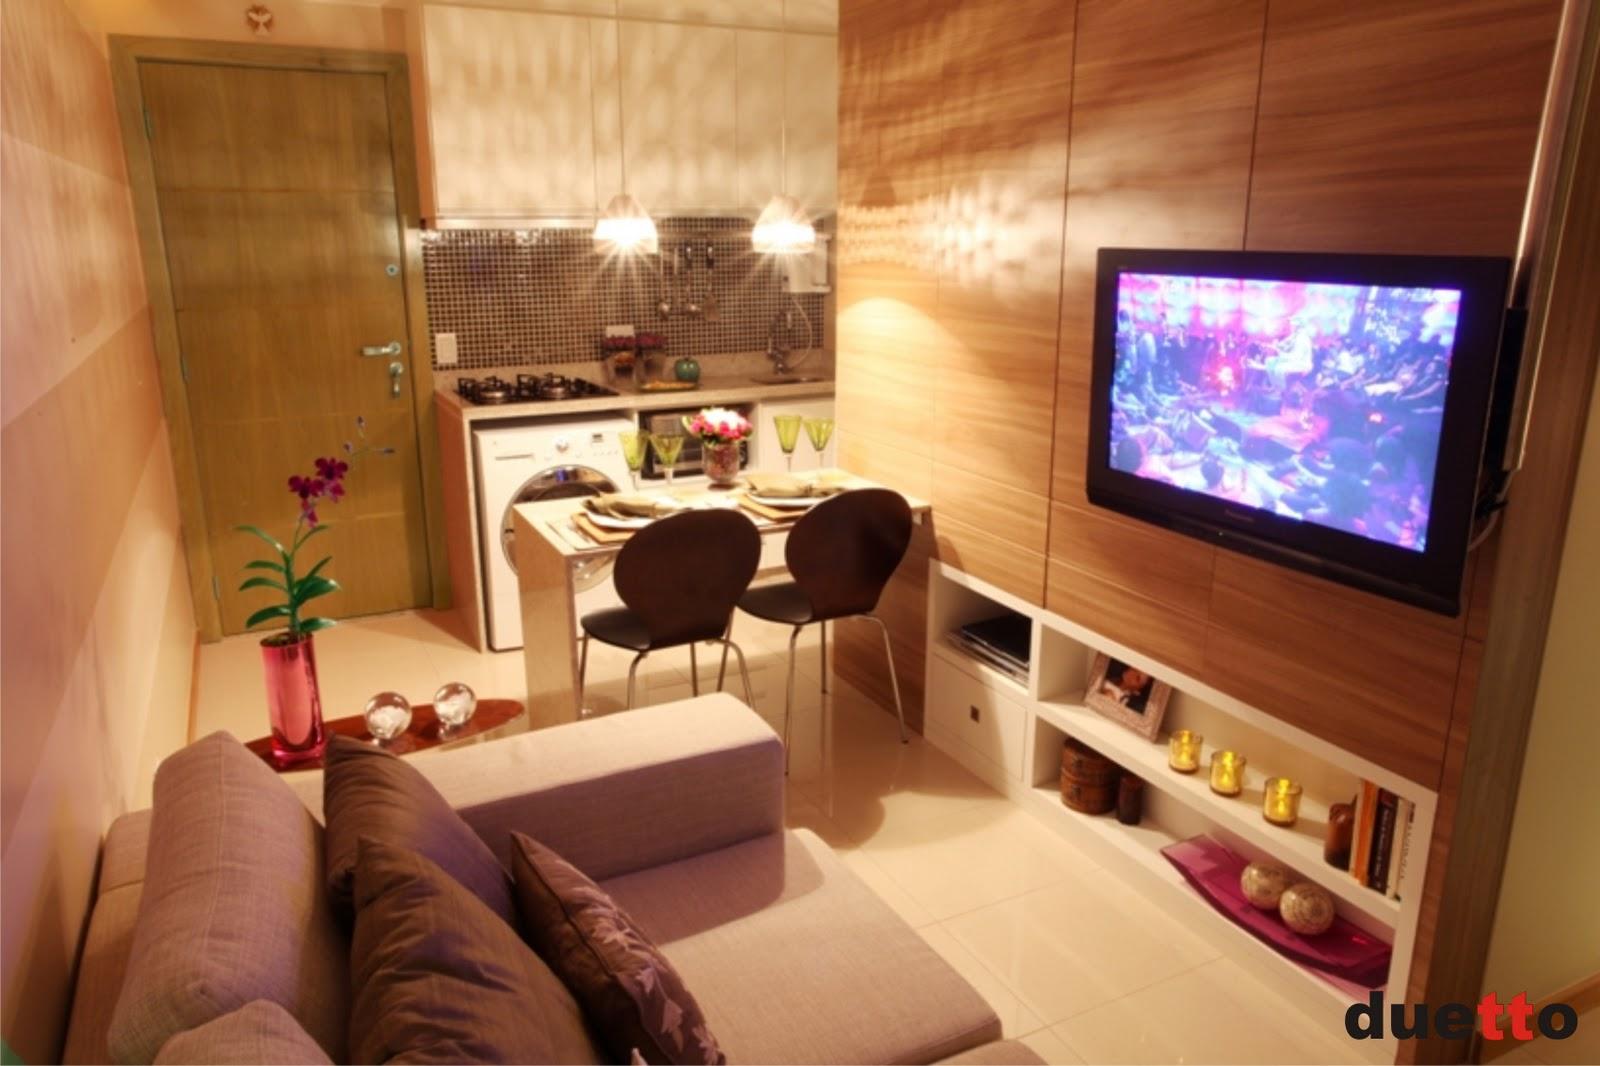 decoracao simples para ambientes pequenos : decoracao simples para ambientes pequenos:No painel da sala escondem-se nichos de diversos tamanhos.